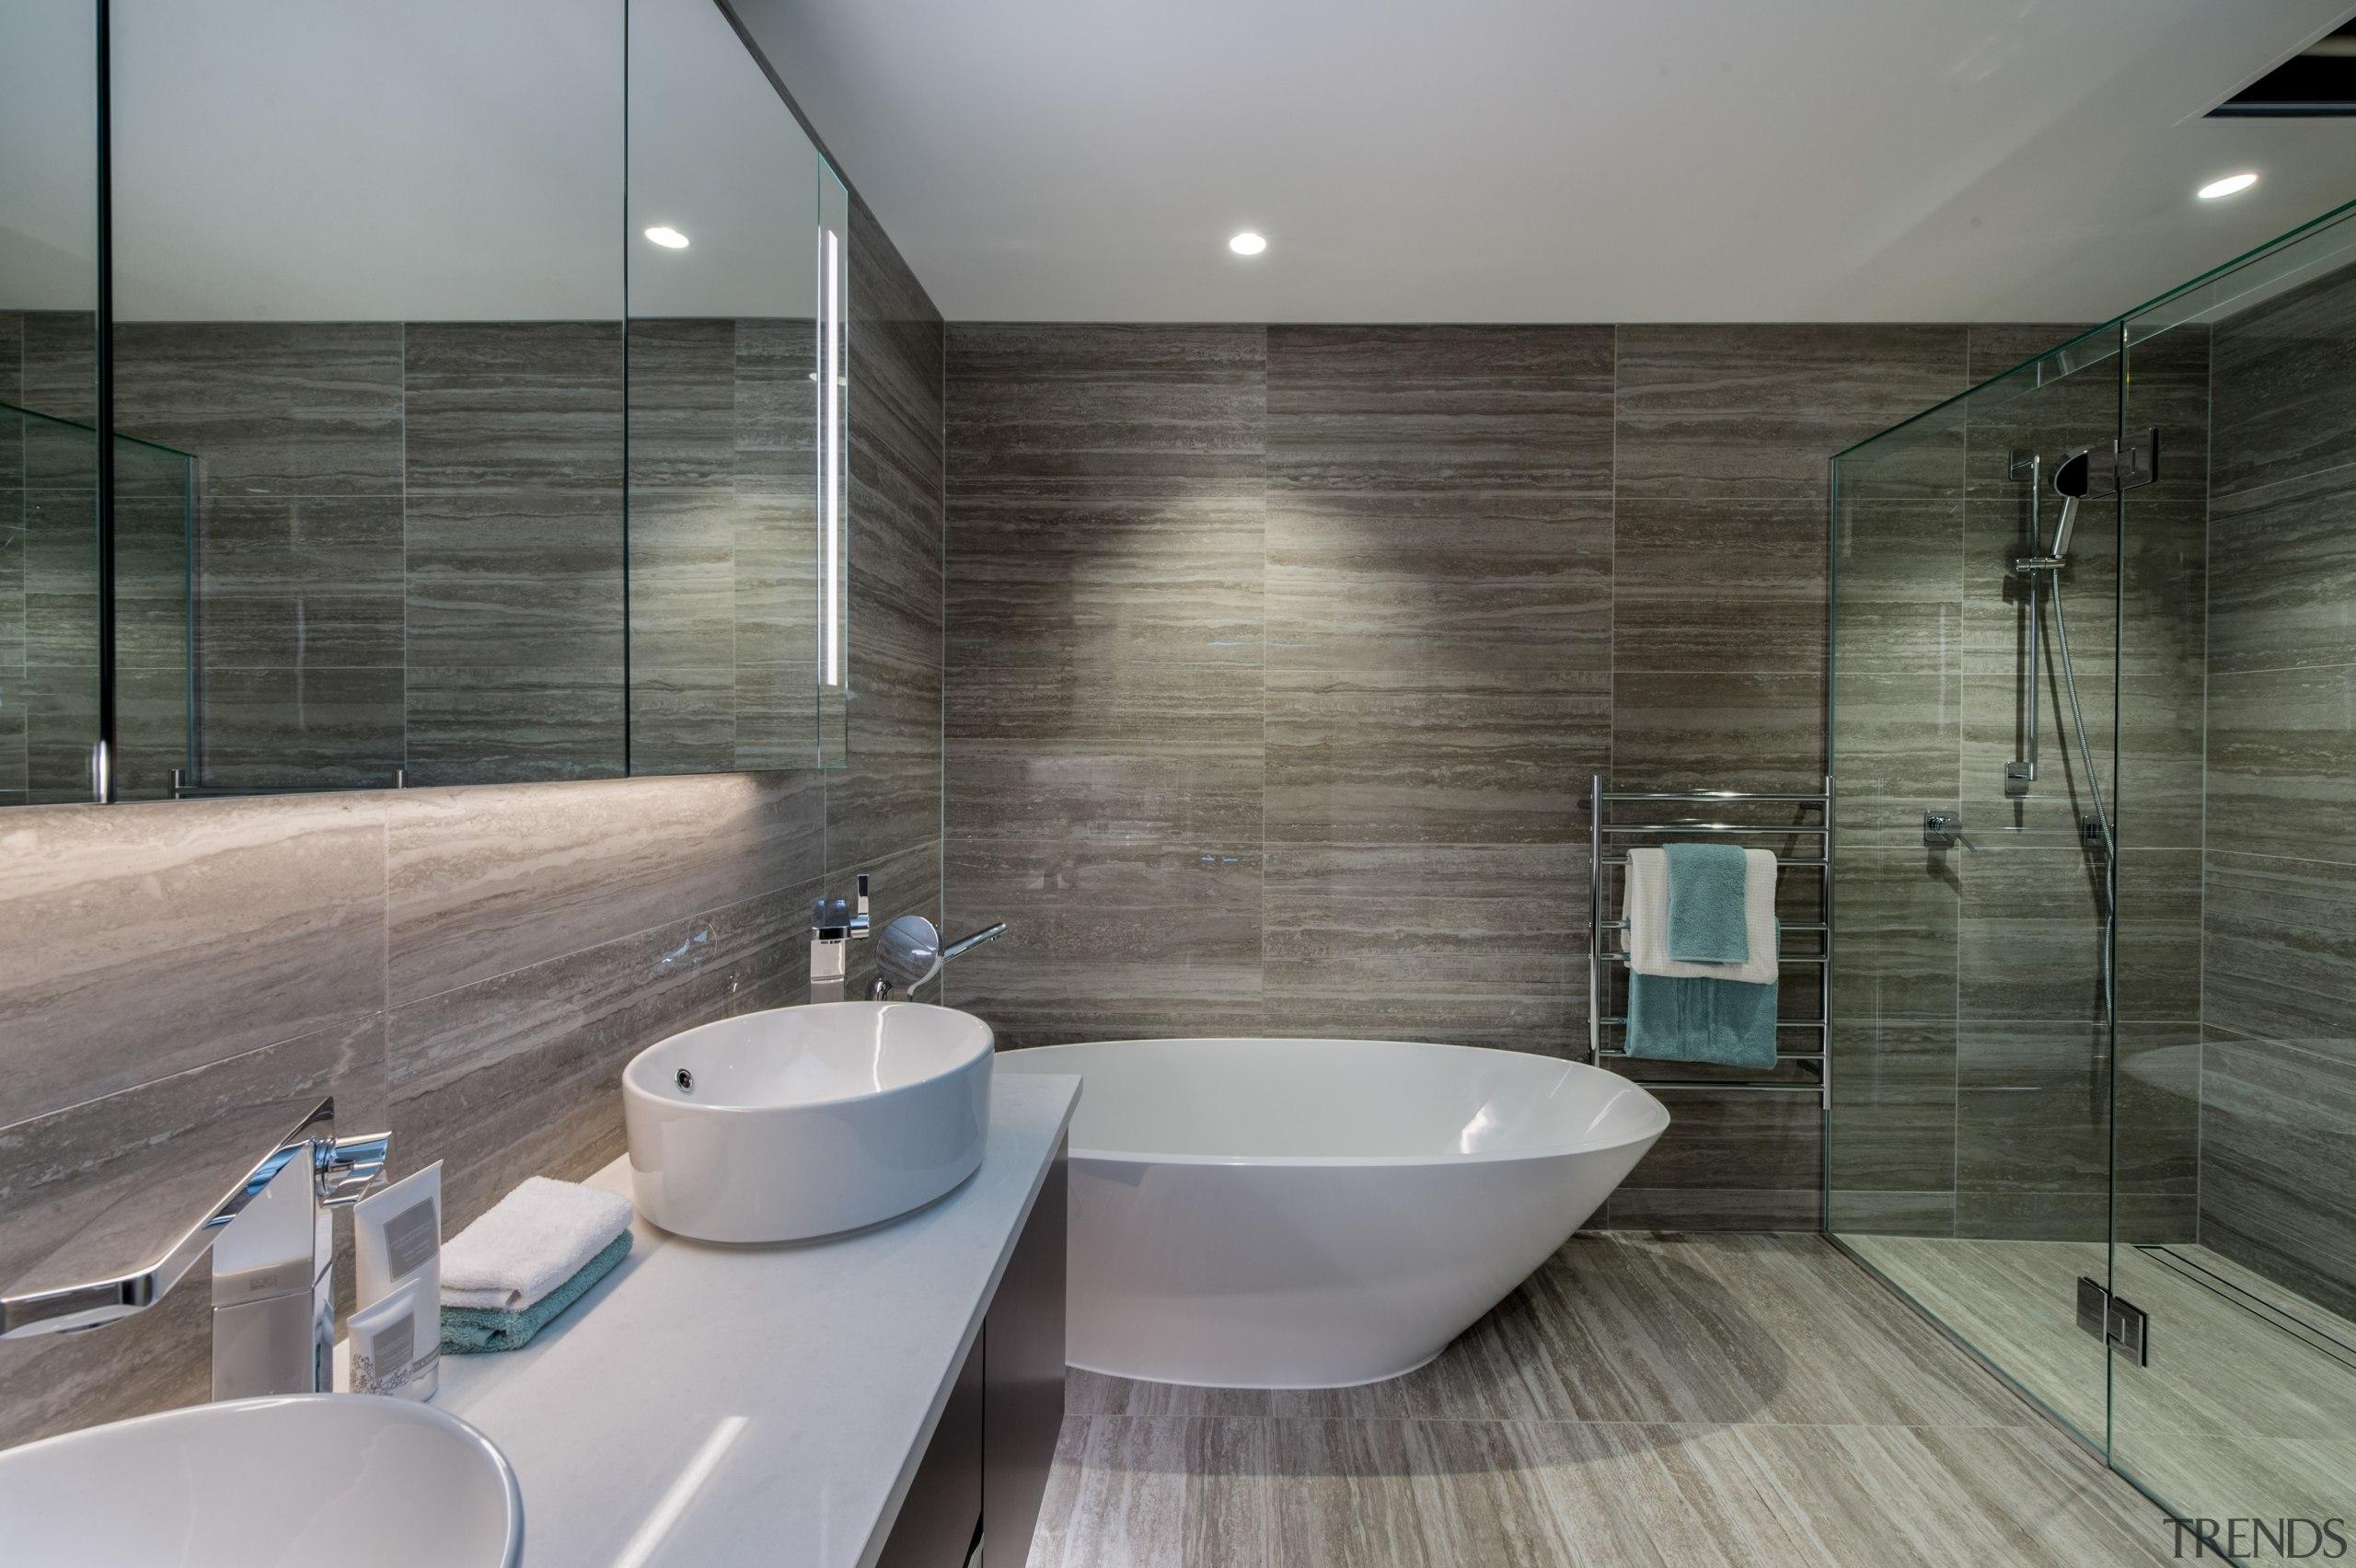 Marble bathroom - Marble bathroom - architecture   architecture, bathroom, floor, interior design, room, tile, gray, black